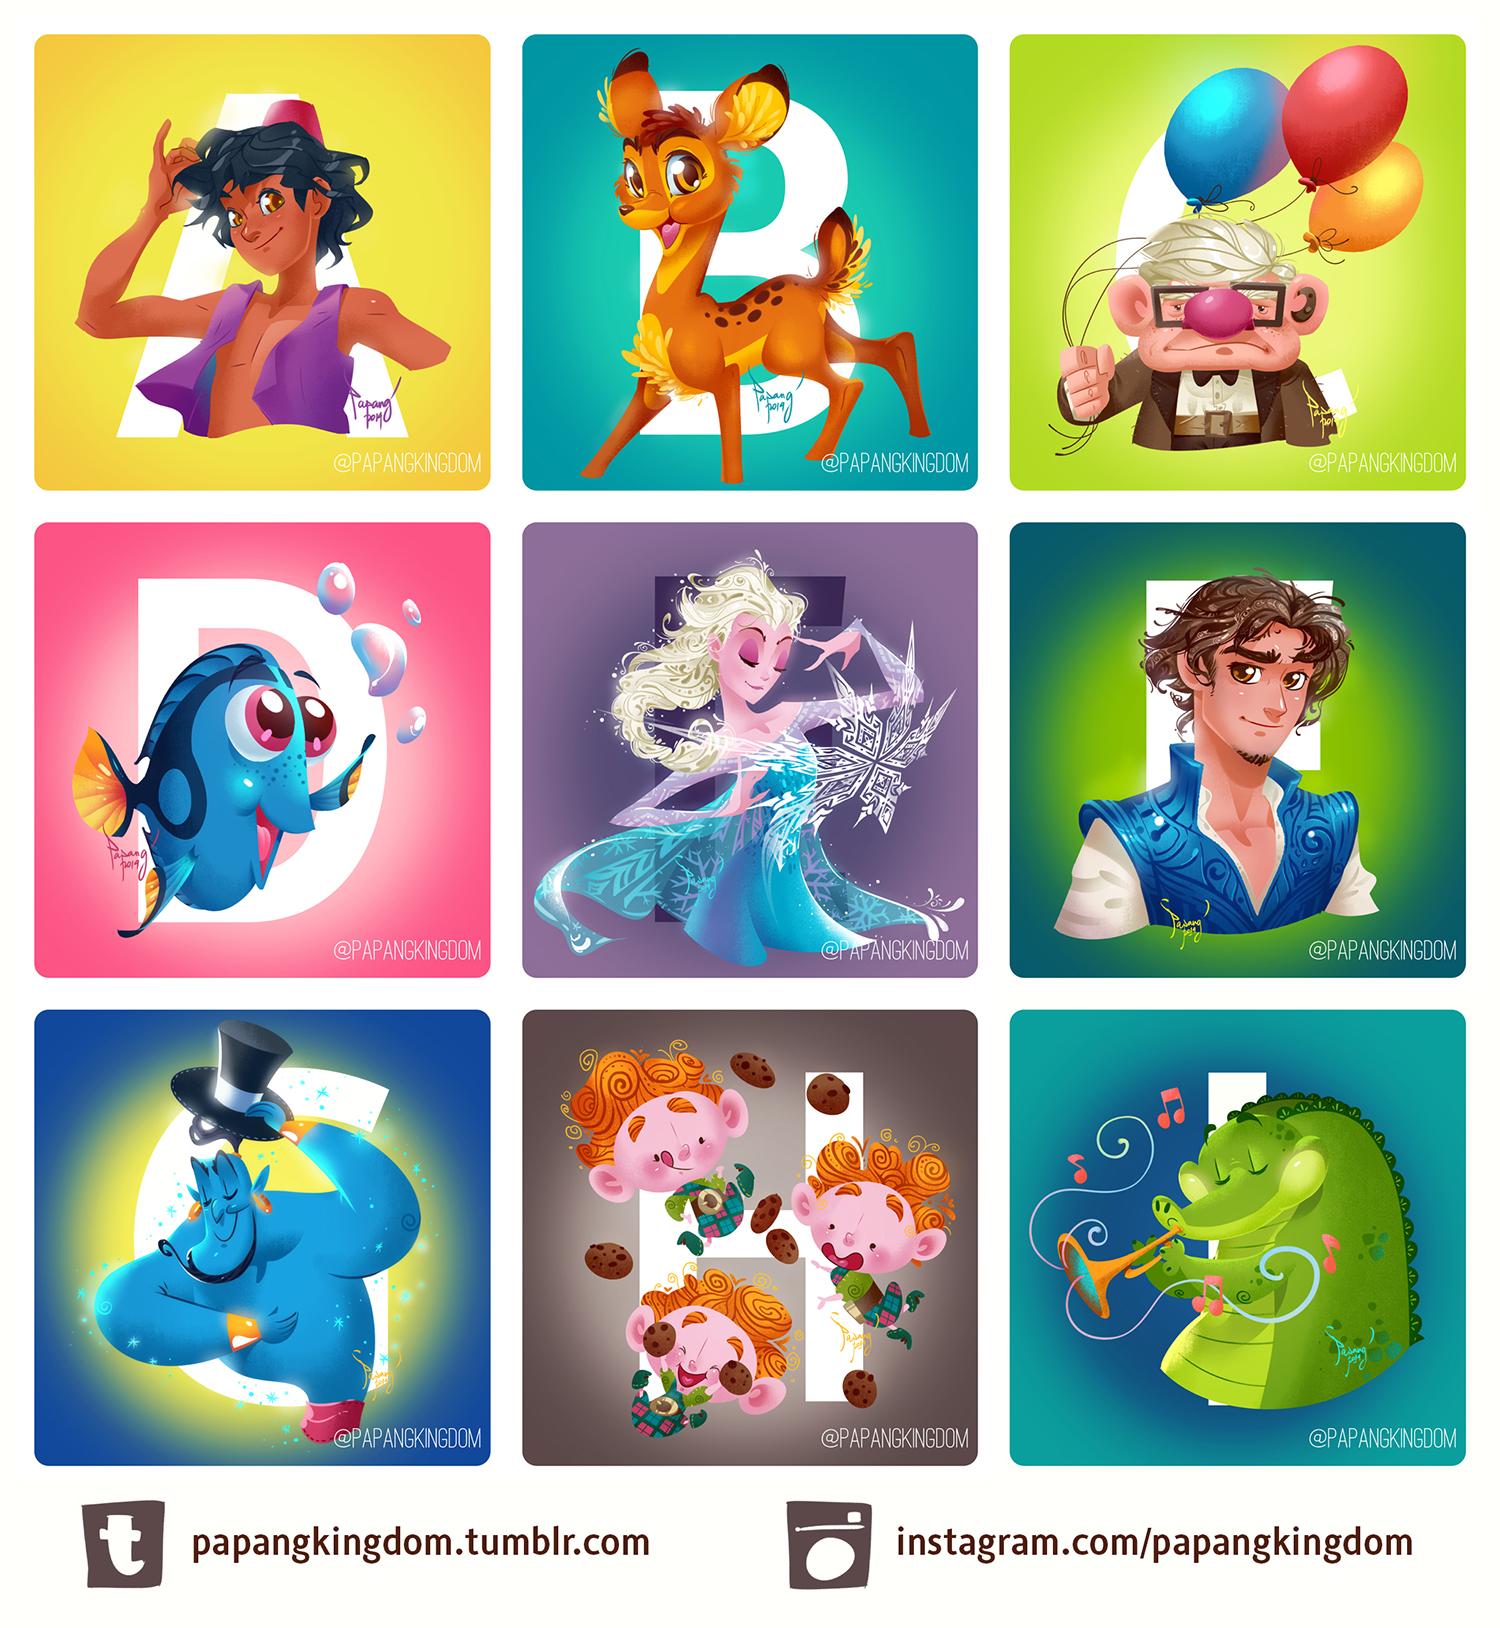 Disney A-Z by pangketepang